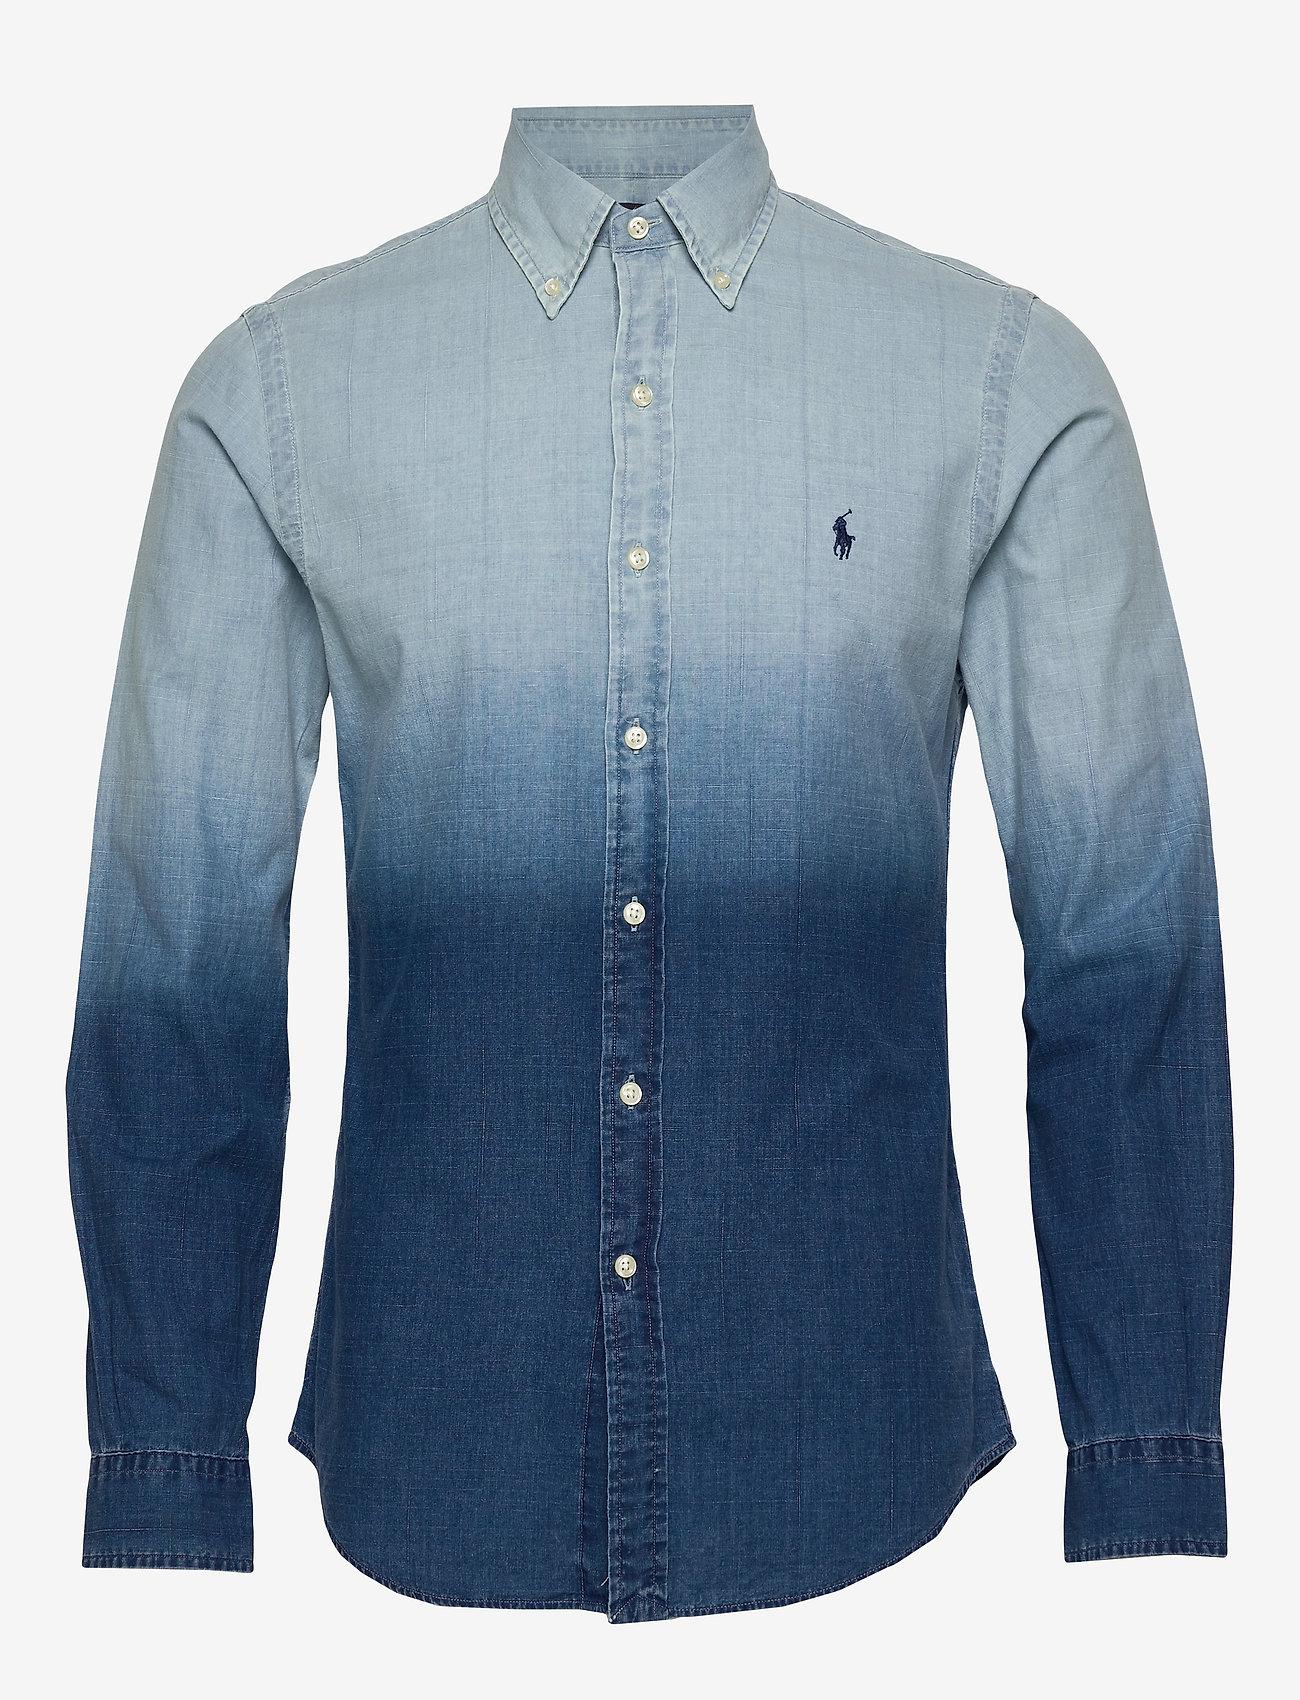 Polo Ralph Lauren - INDIGO SOLID-SL BD PPCSPT - podstawowe koszulki - 4380 blue dip dye - 0